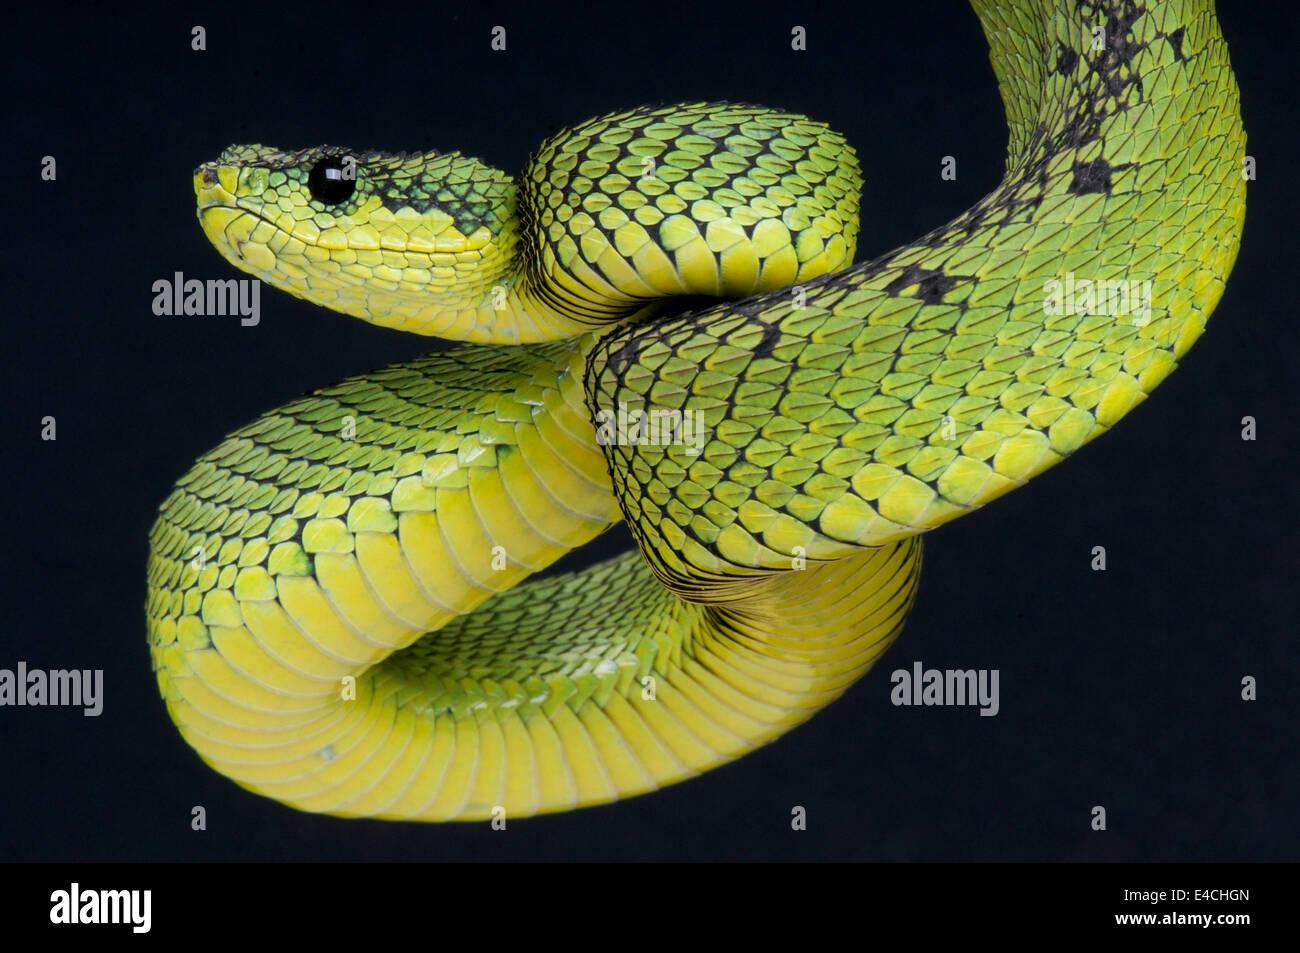 Bush viper / Grands Lacs Atheris nitschei Photo Stock